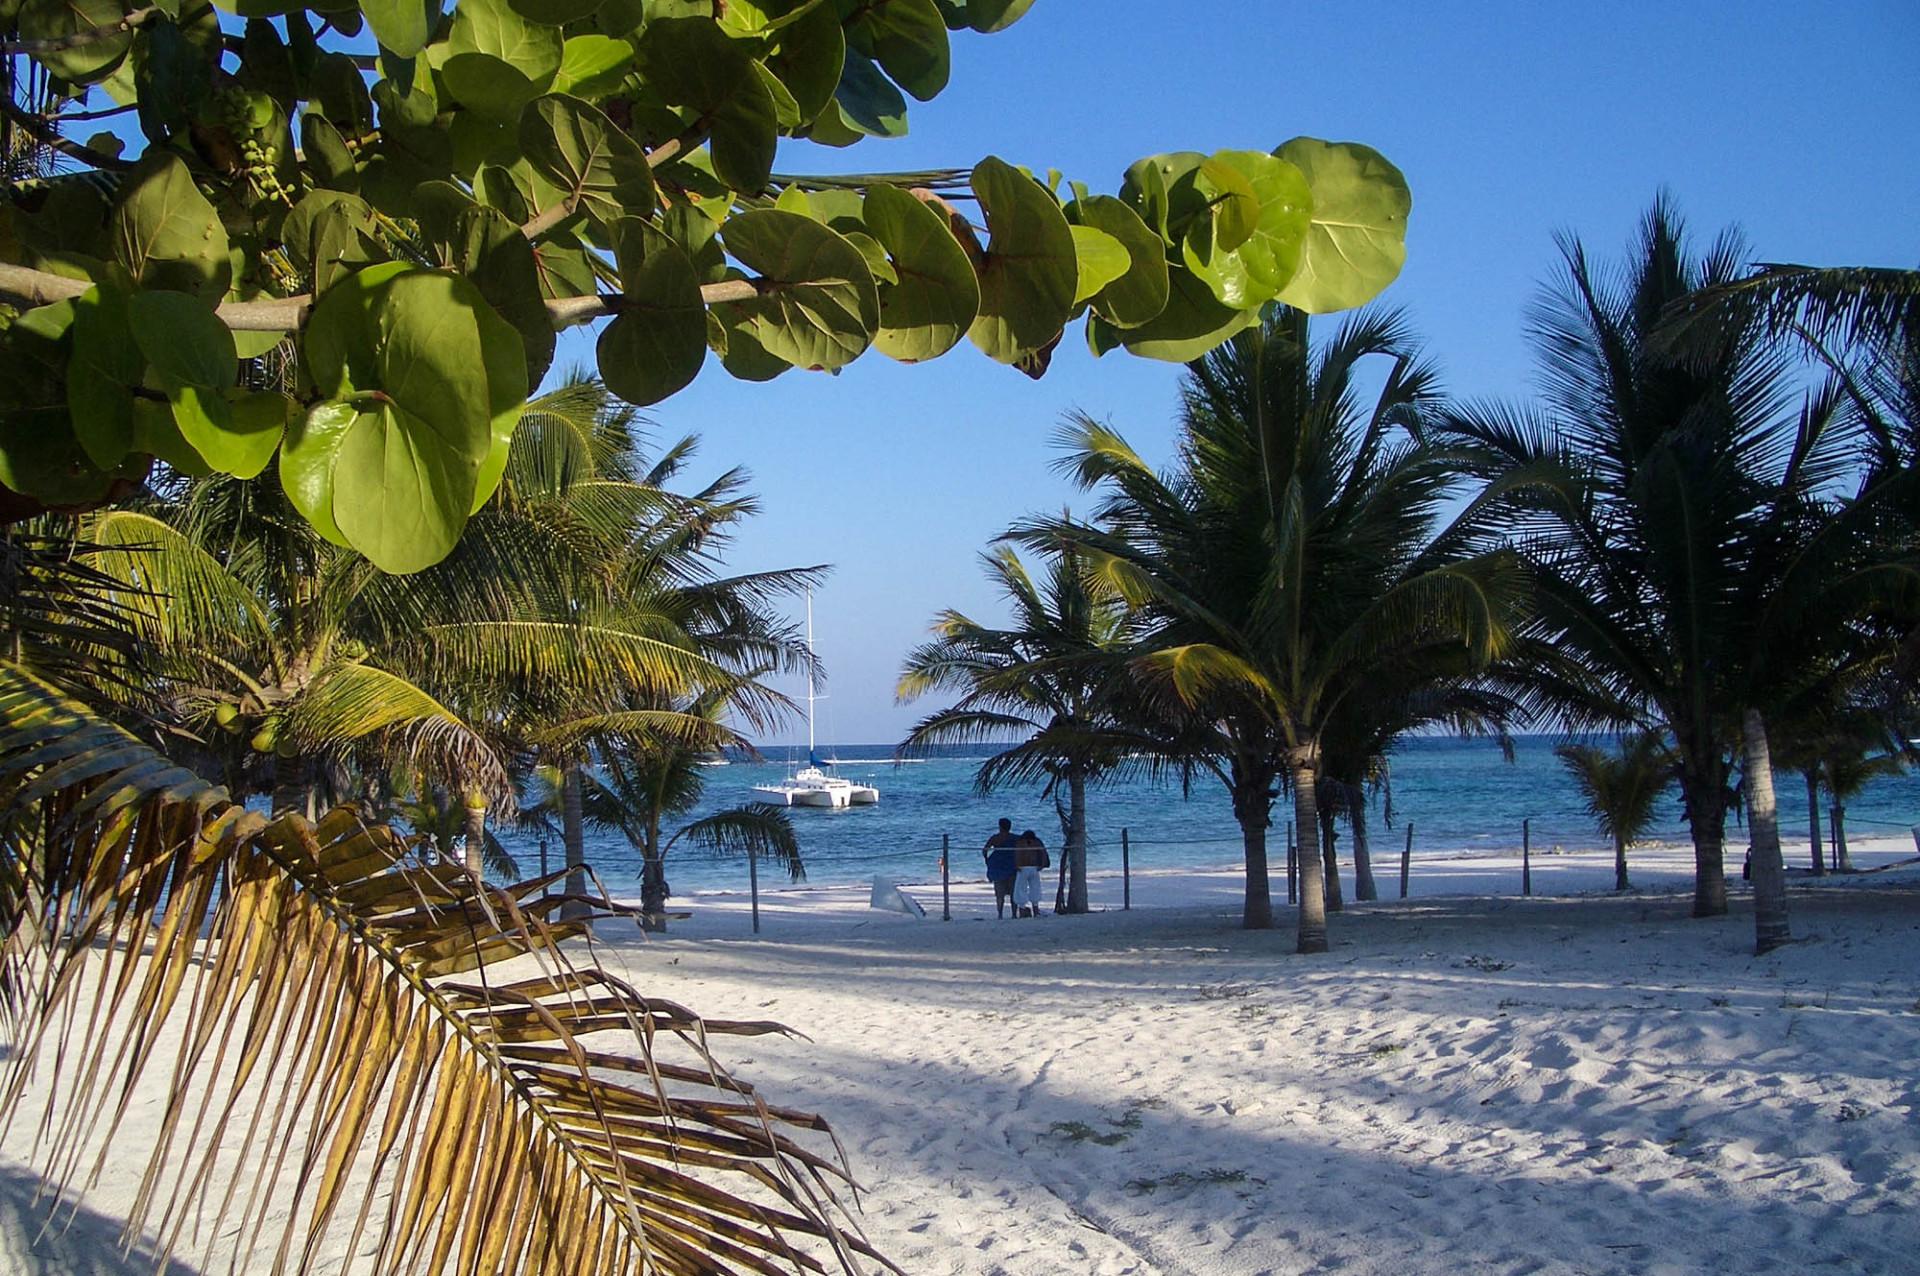 Karibik Reiseführer, Karibik Tipps